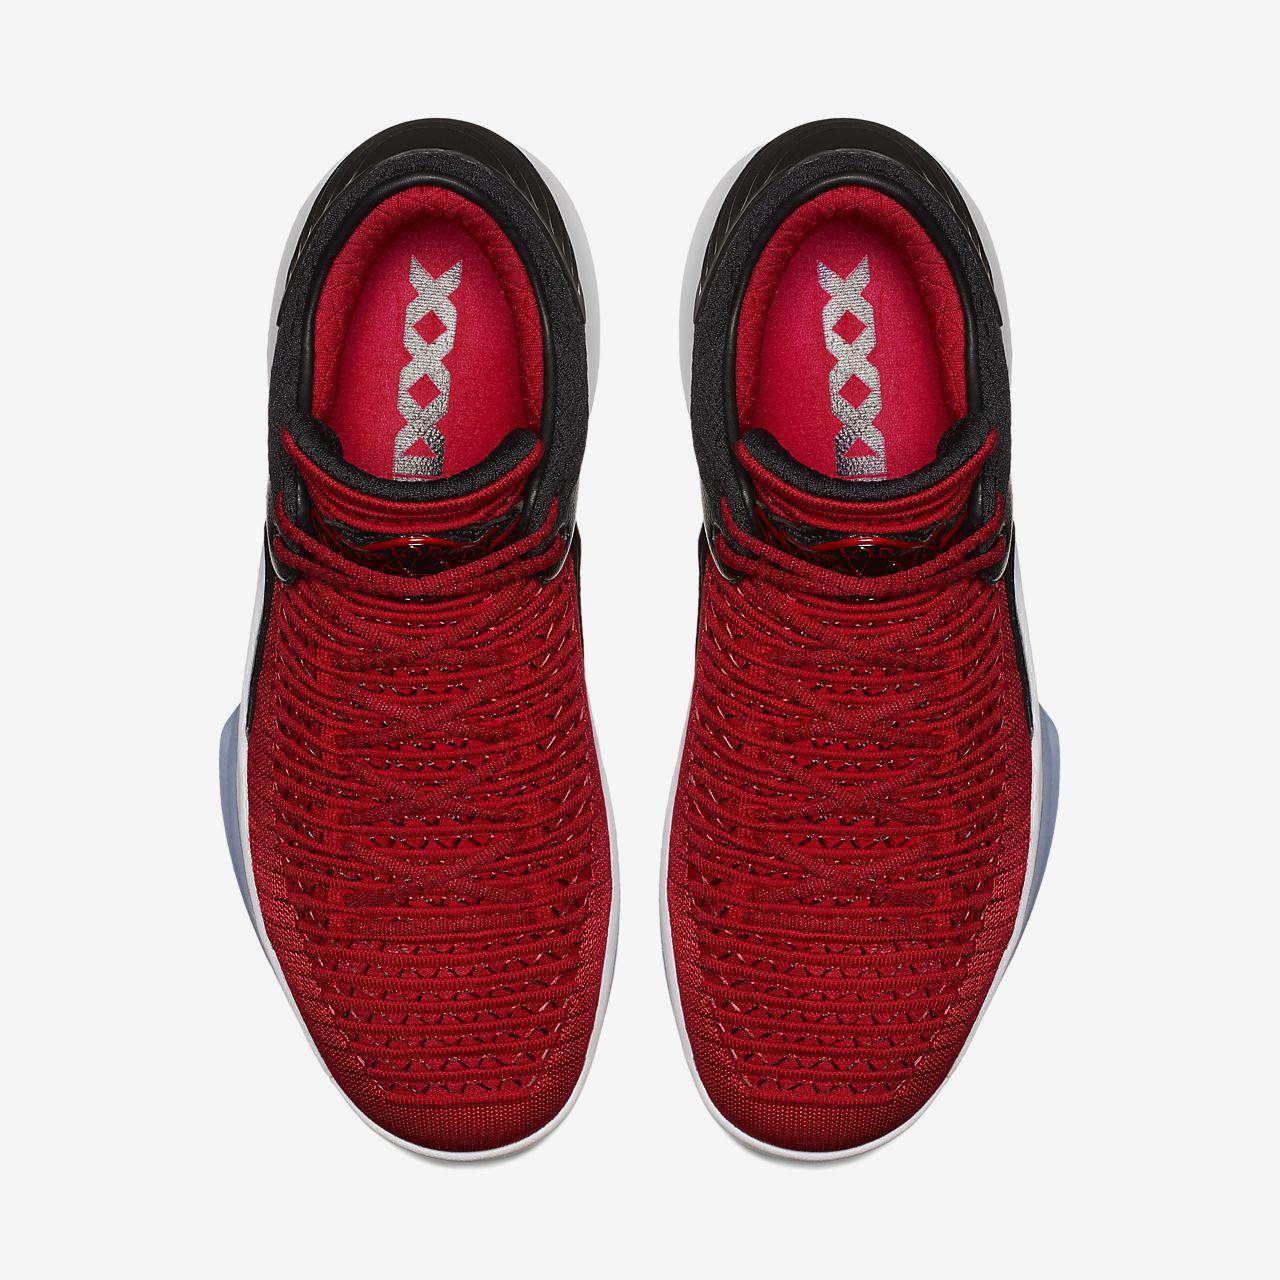 27941cec591 Air Jordan XXXII Low Win Like 96 Men's Basketball Shoes